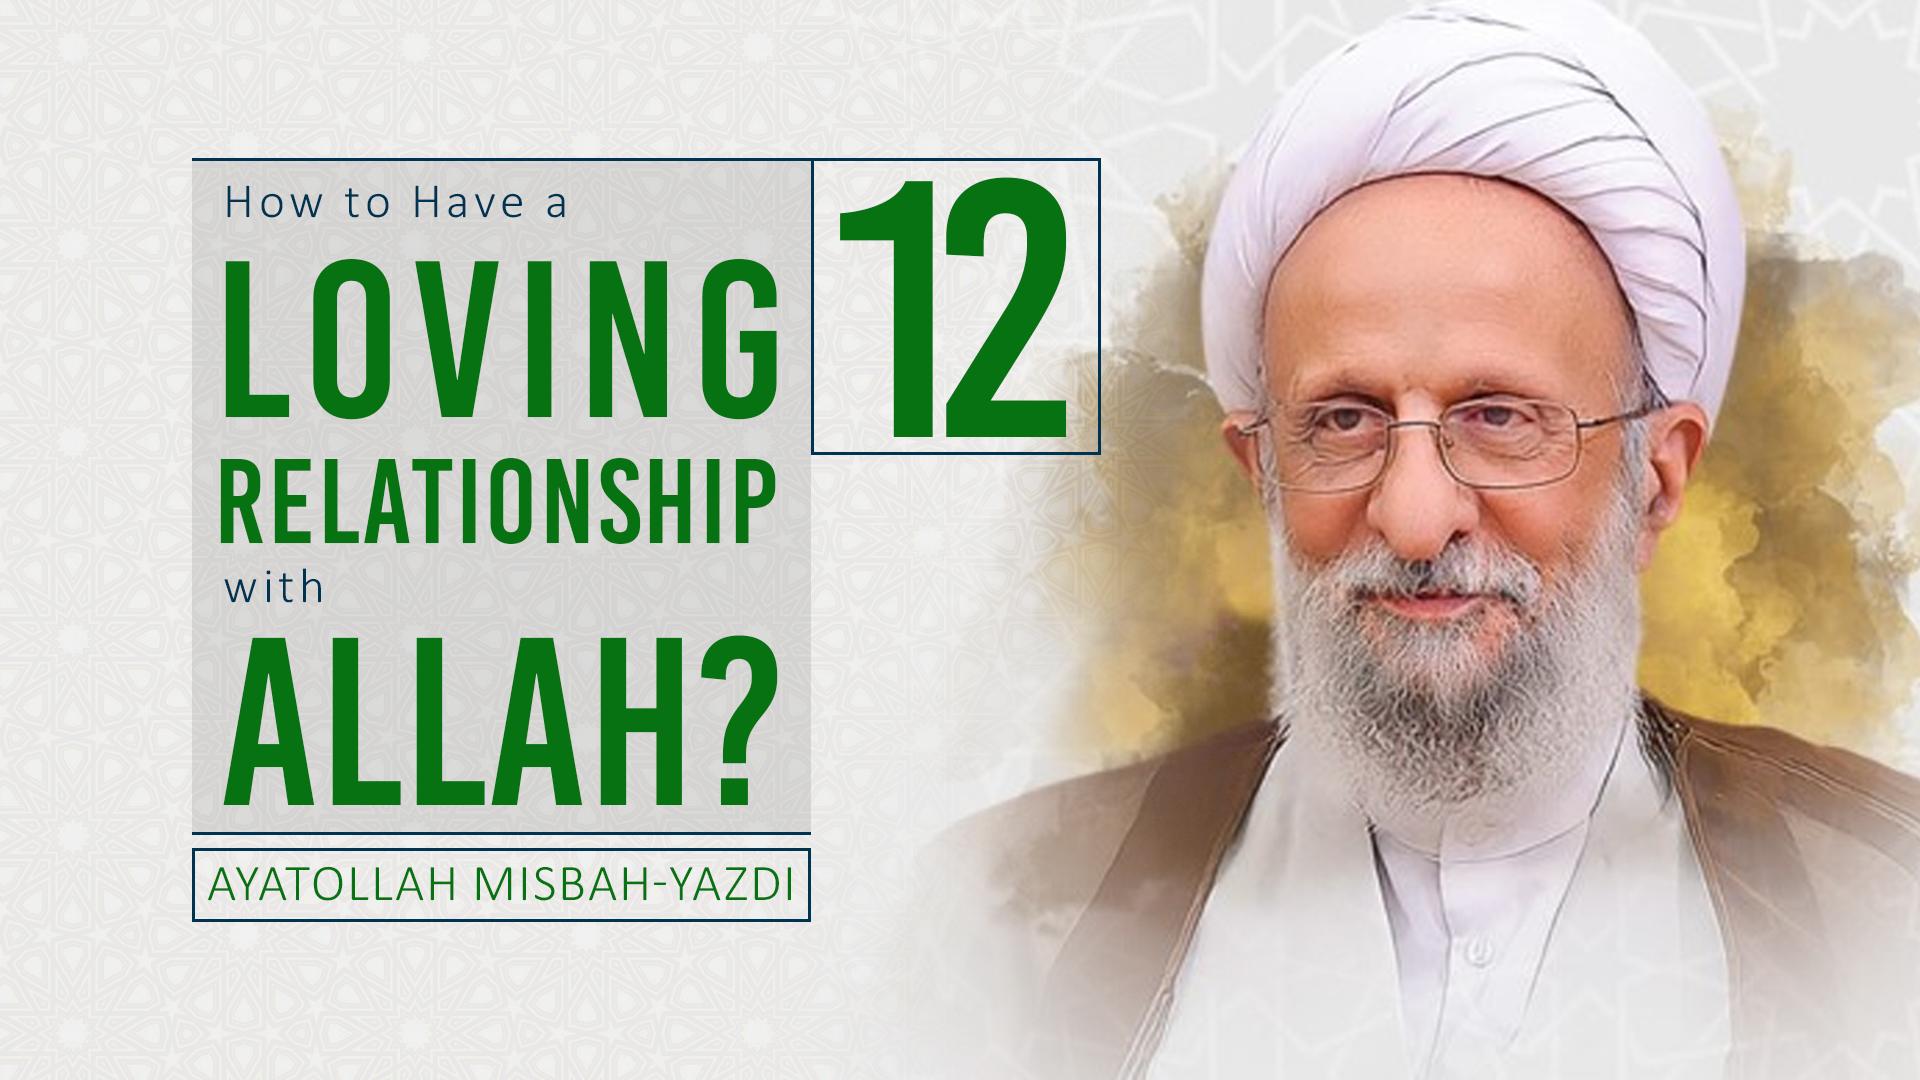 [12] How to Have a Loving Relationship with Allah? | Ayatollah Misbah-Yazdi | Farsi Sub English